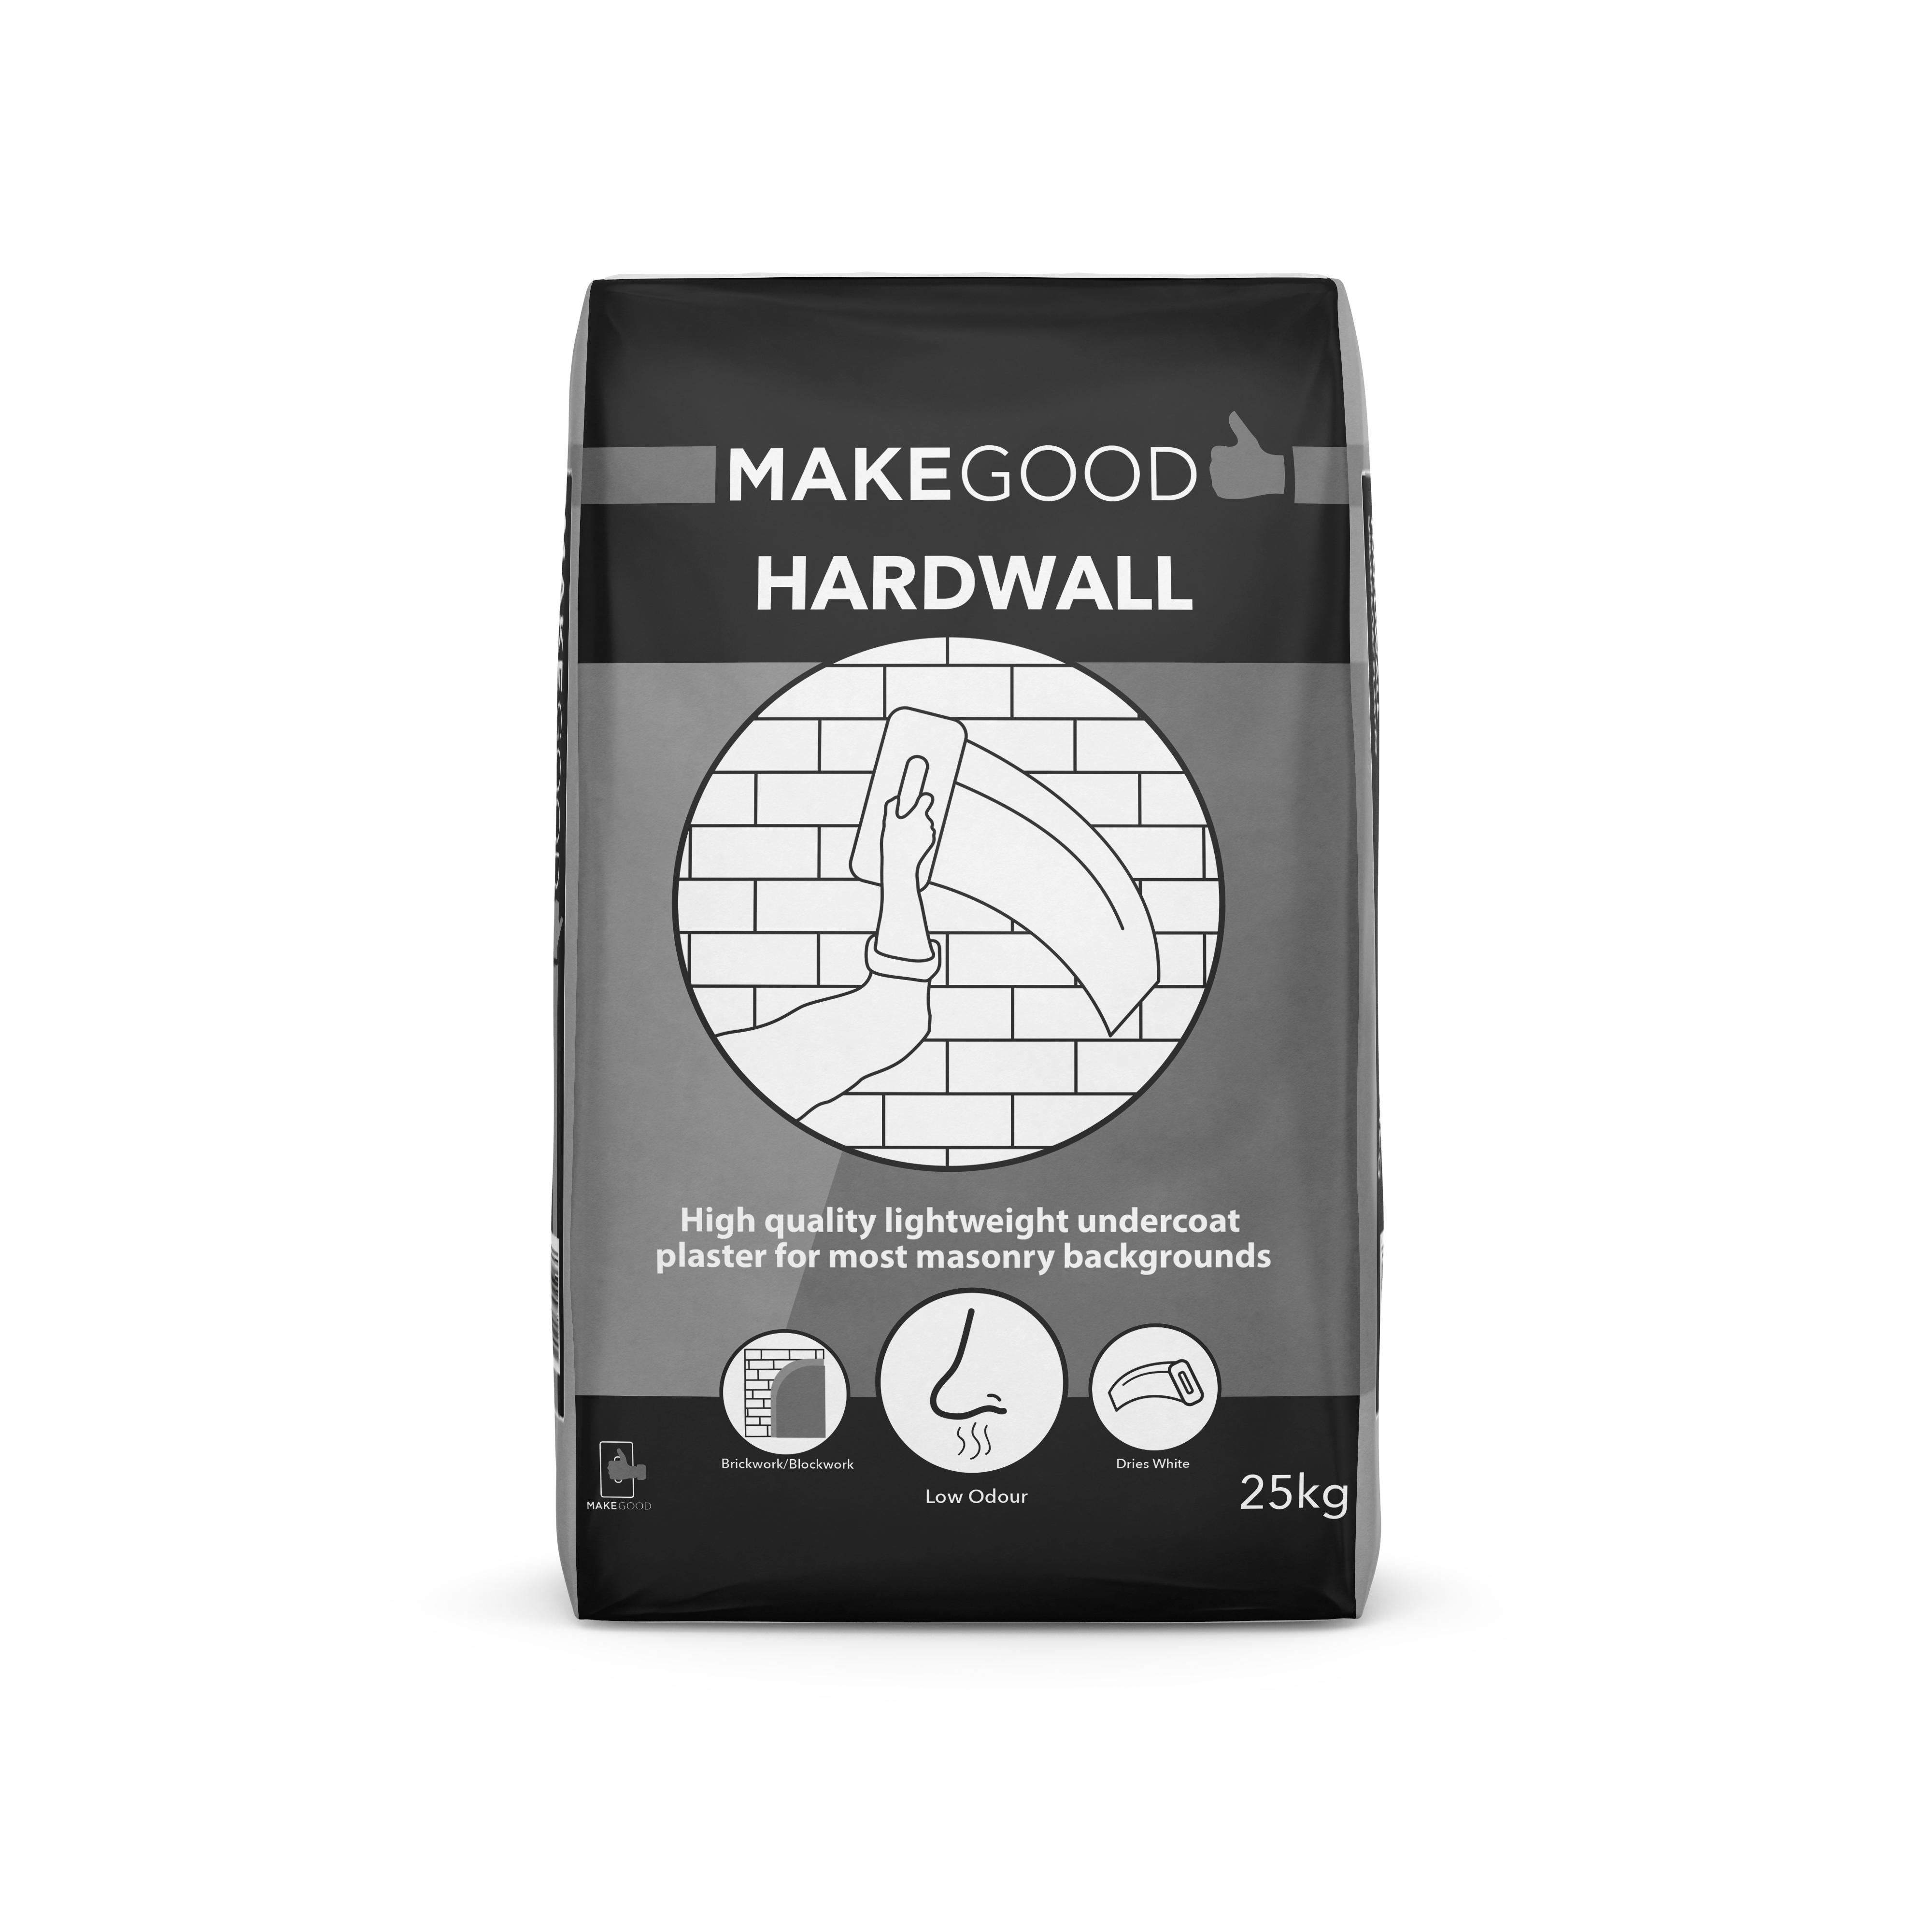 Make Good Hardwall 25kg